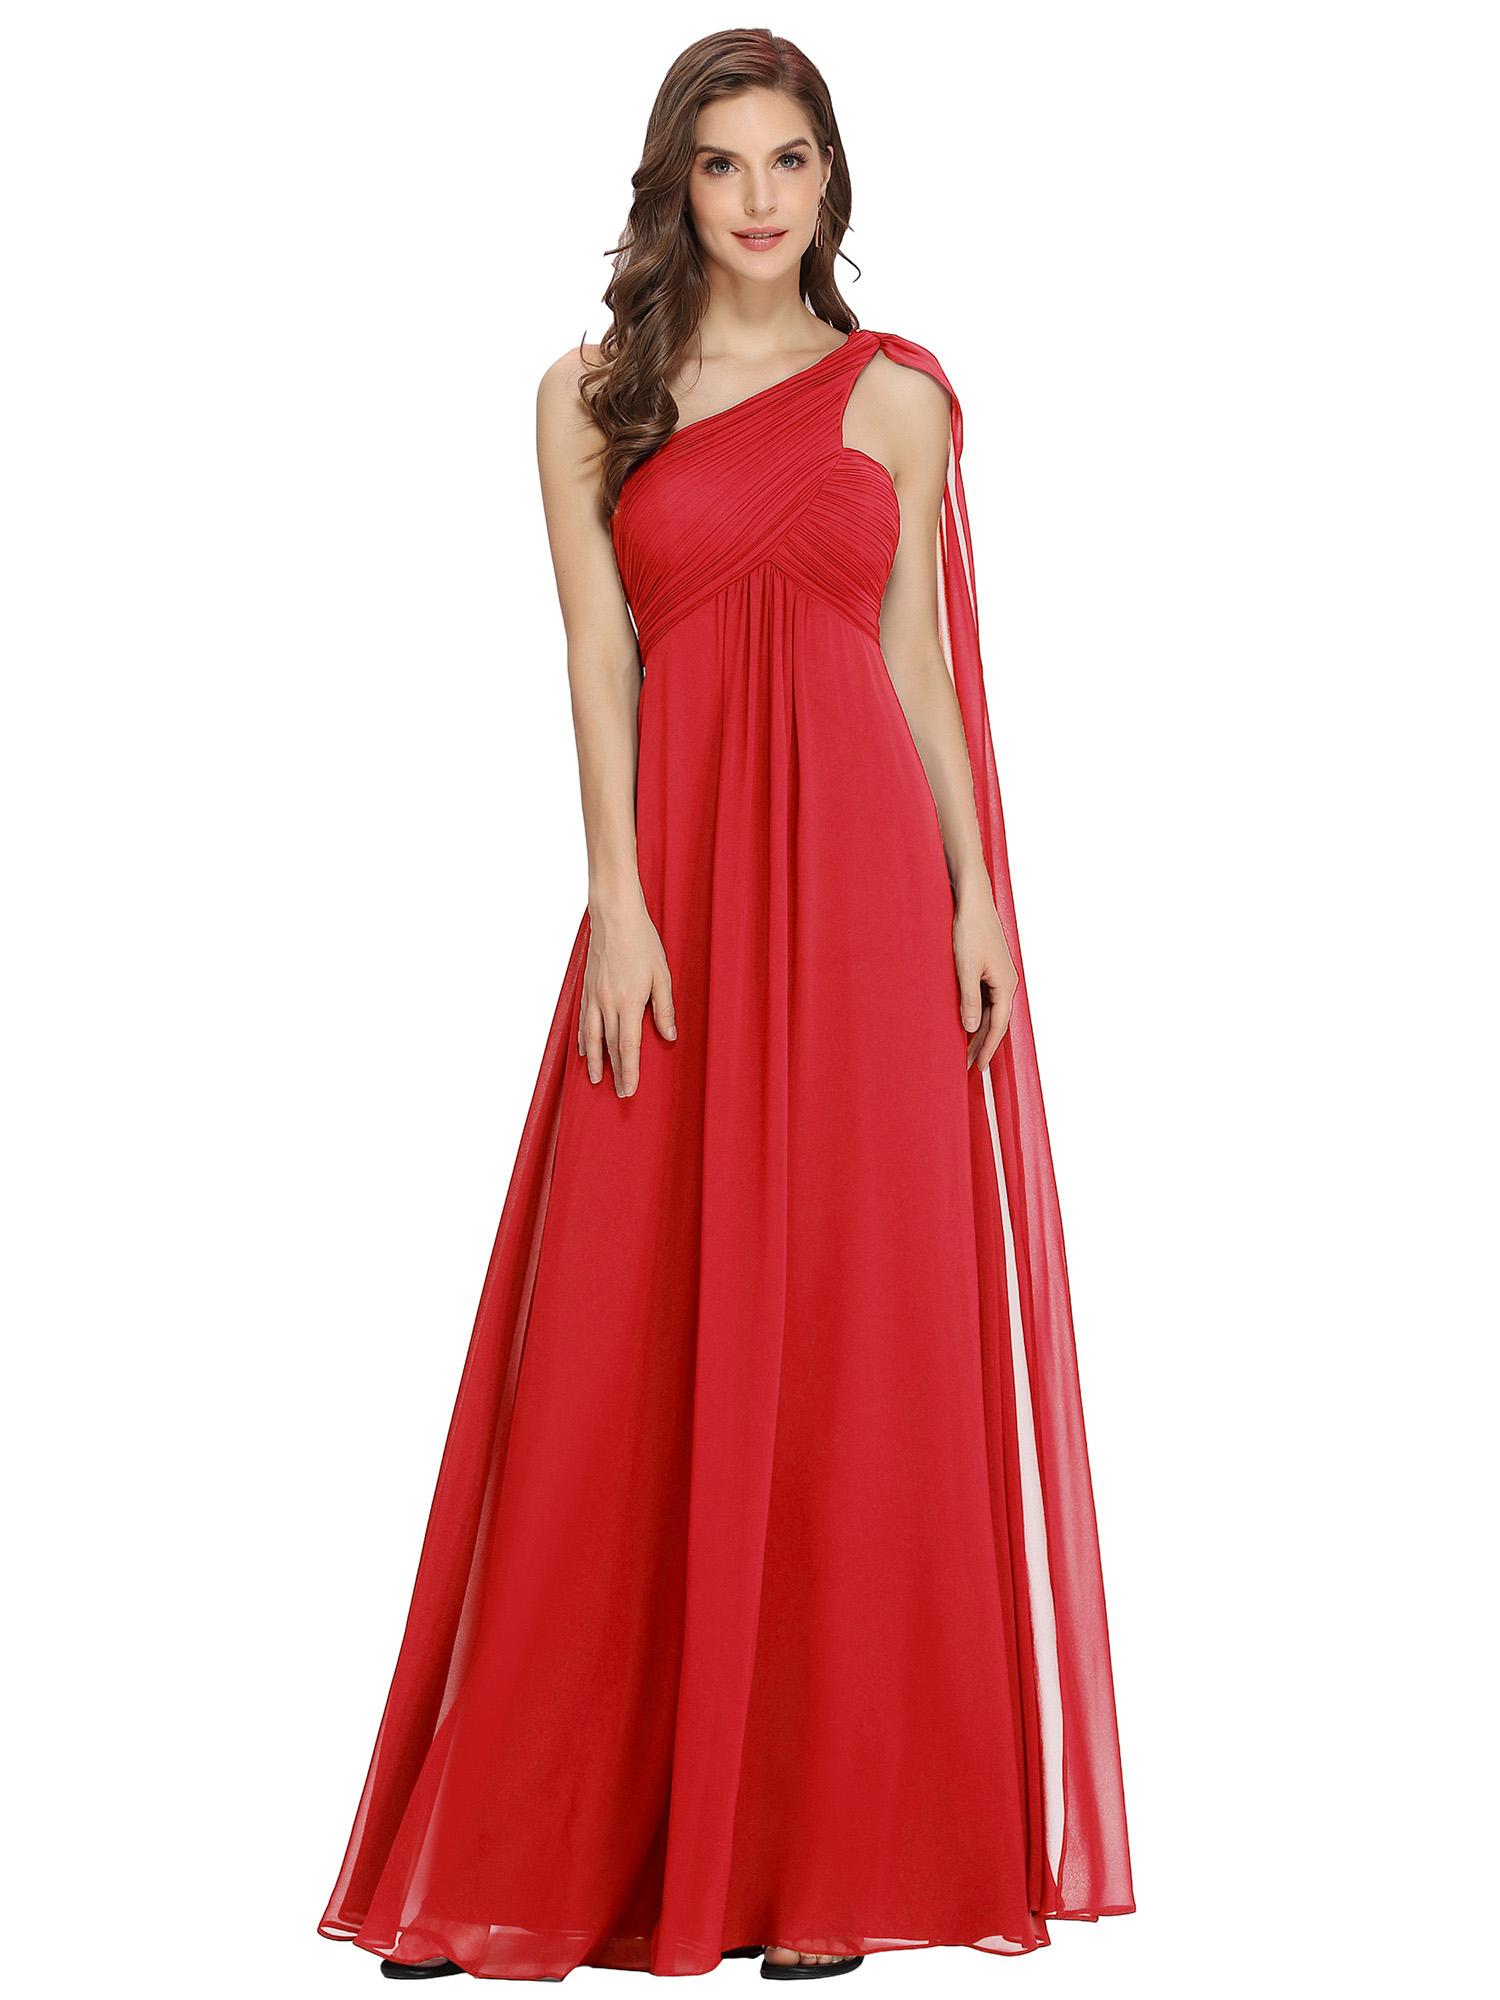 Ever-Pretty-Bridesmaid-Dresses-Chiffon-Ribbon-Long-Formal-Cocktail-Party-Dress thumbnail 28